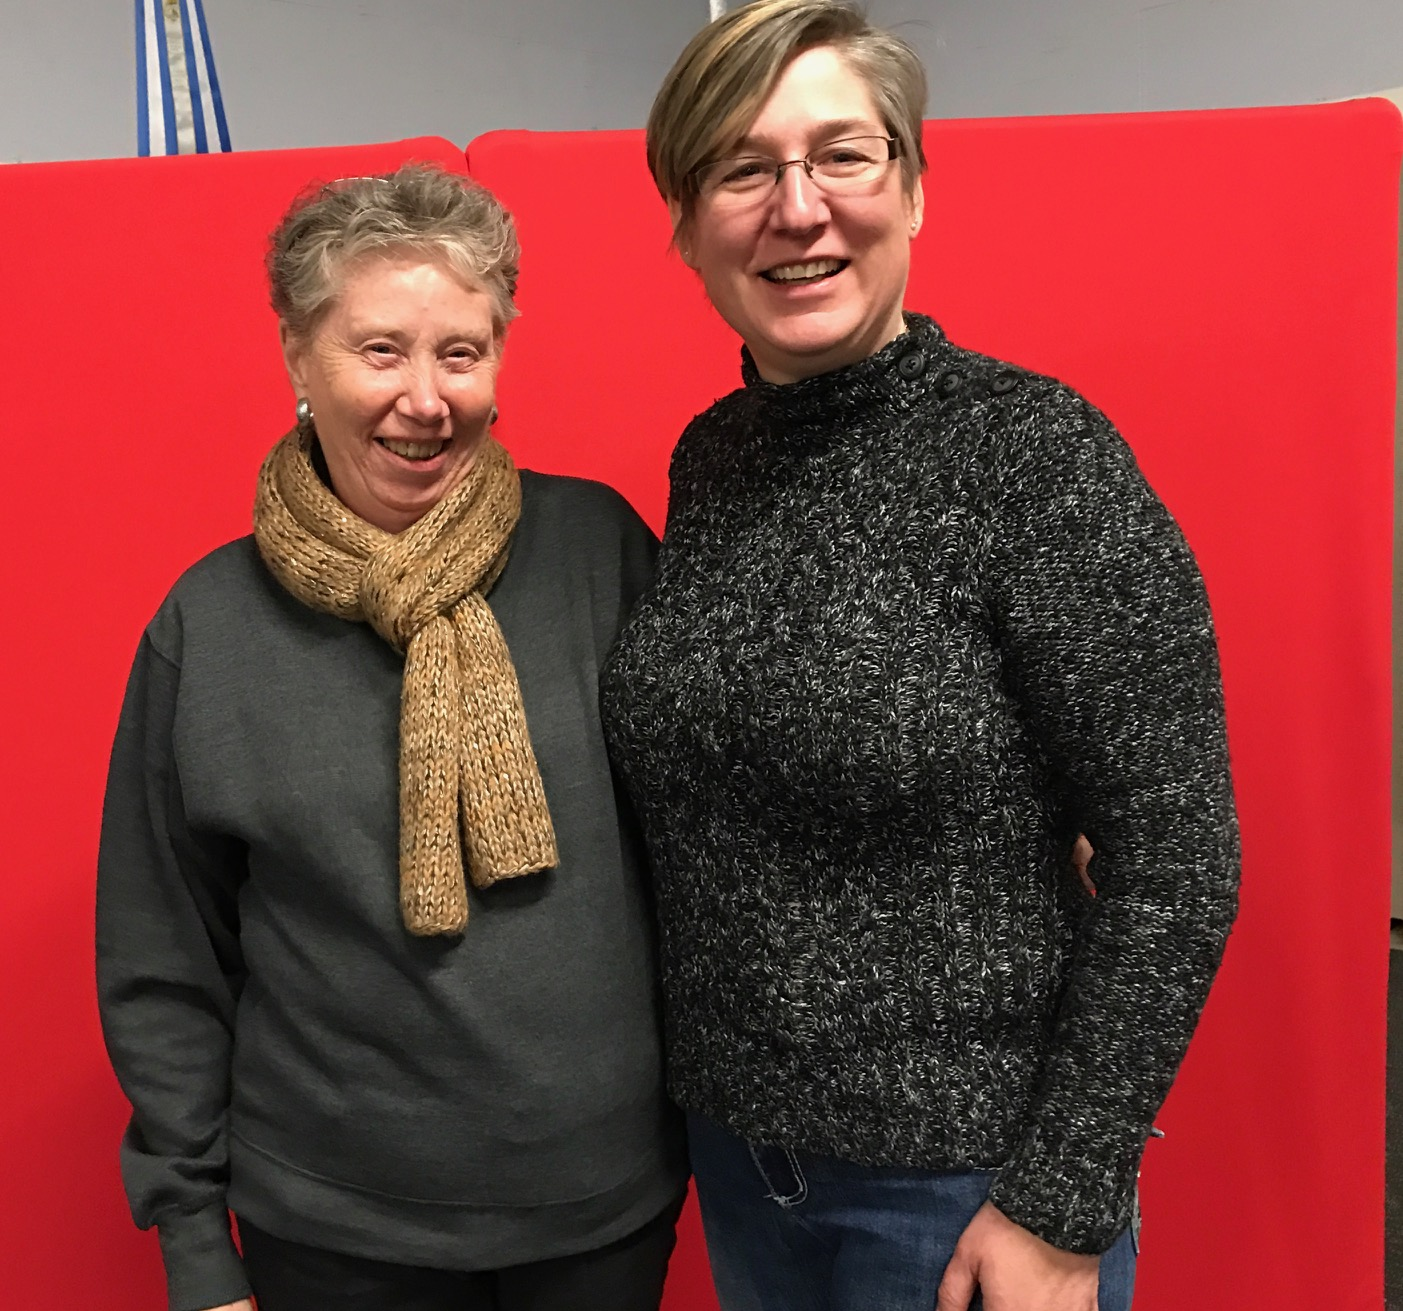 Lori Little & Sharon Cameron